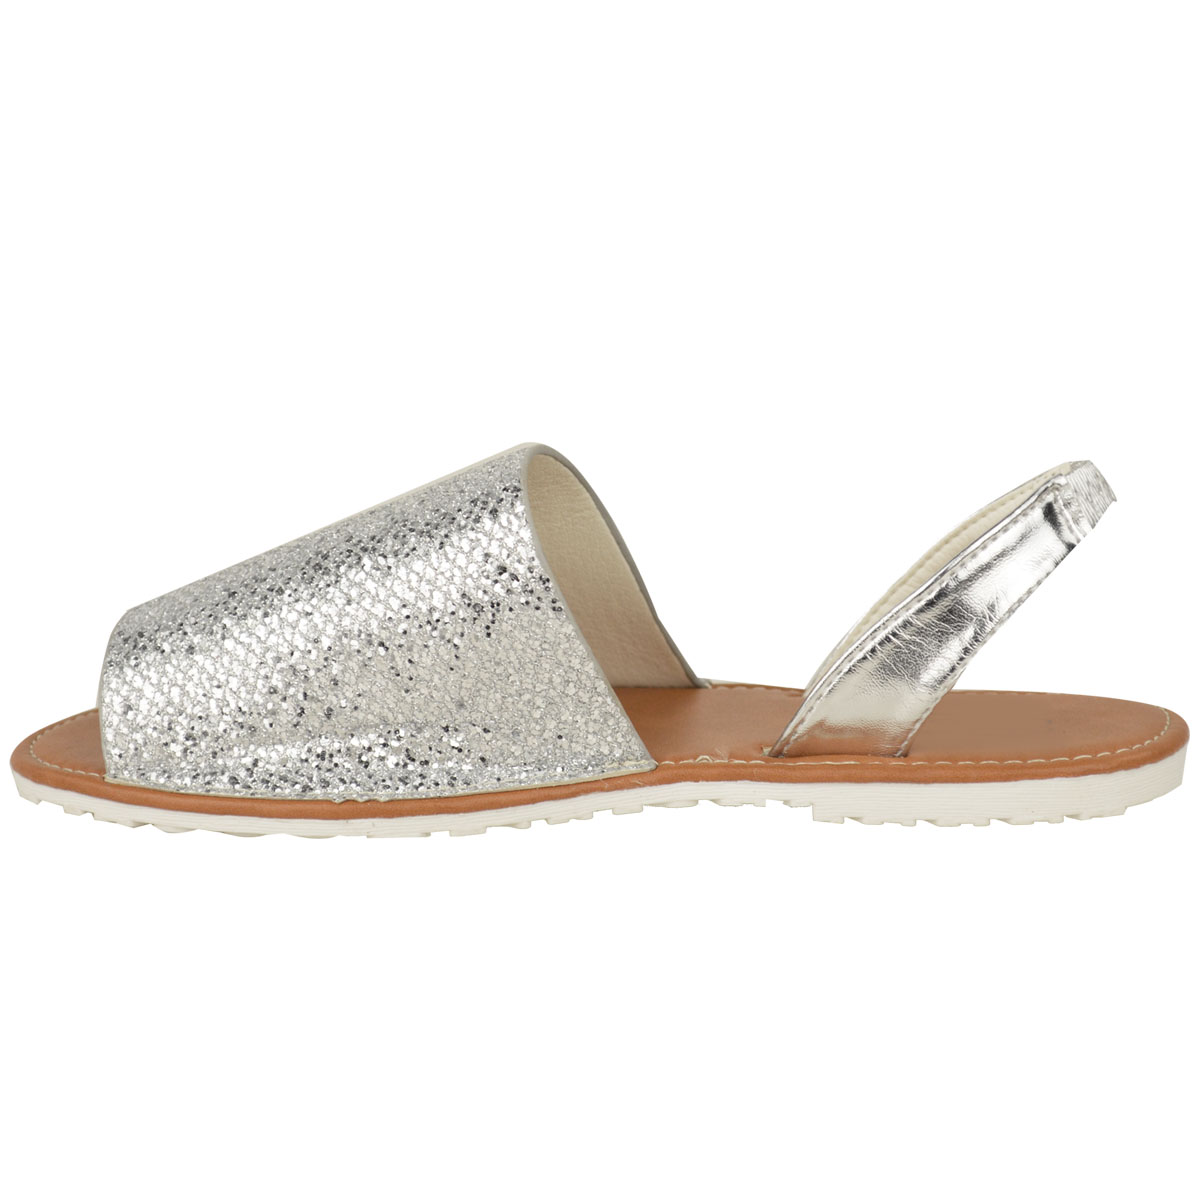 New Womens Ladies Summer Menorcan Sandals Glitter Flip